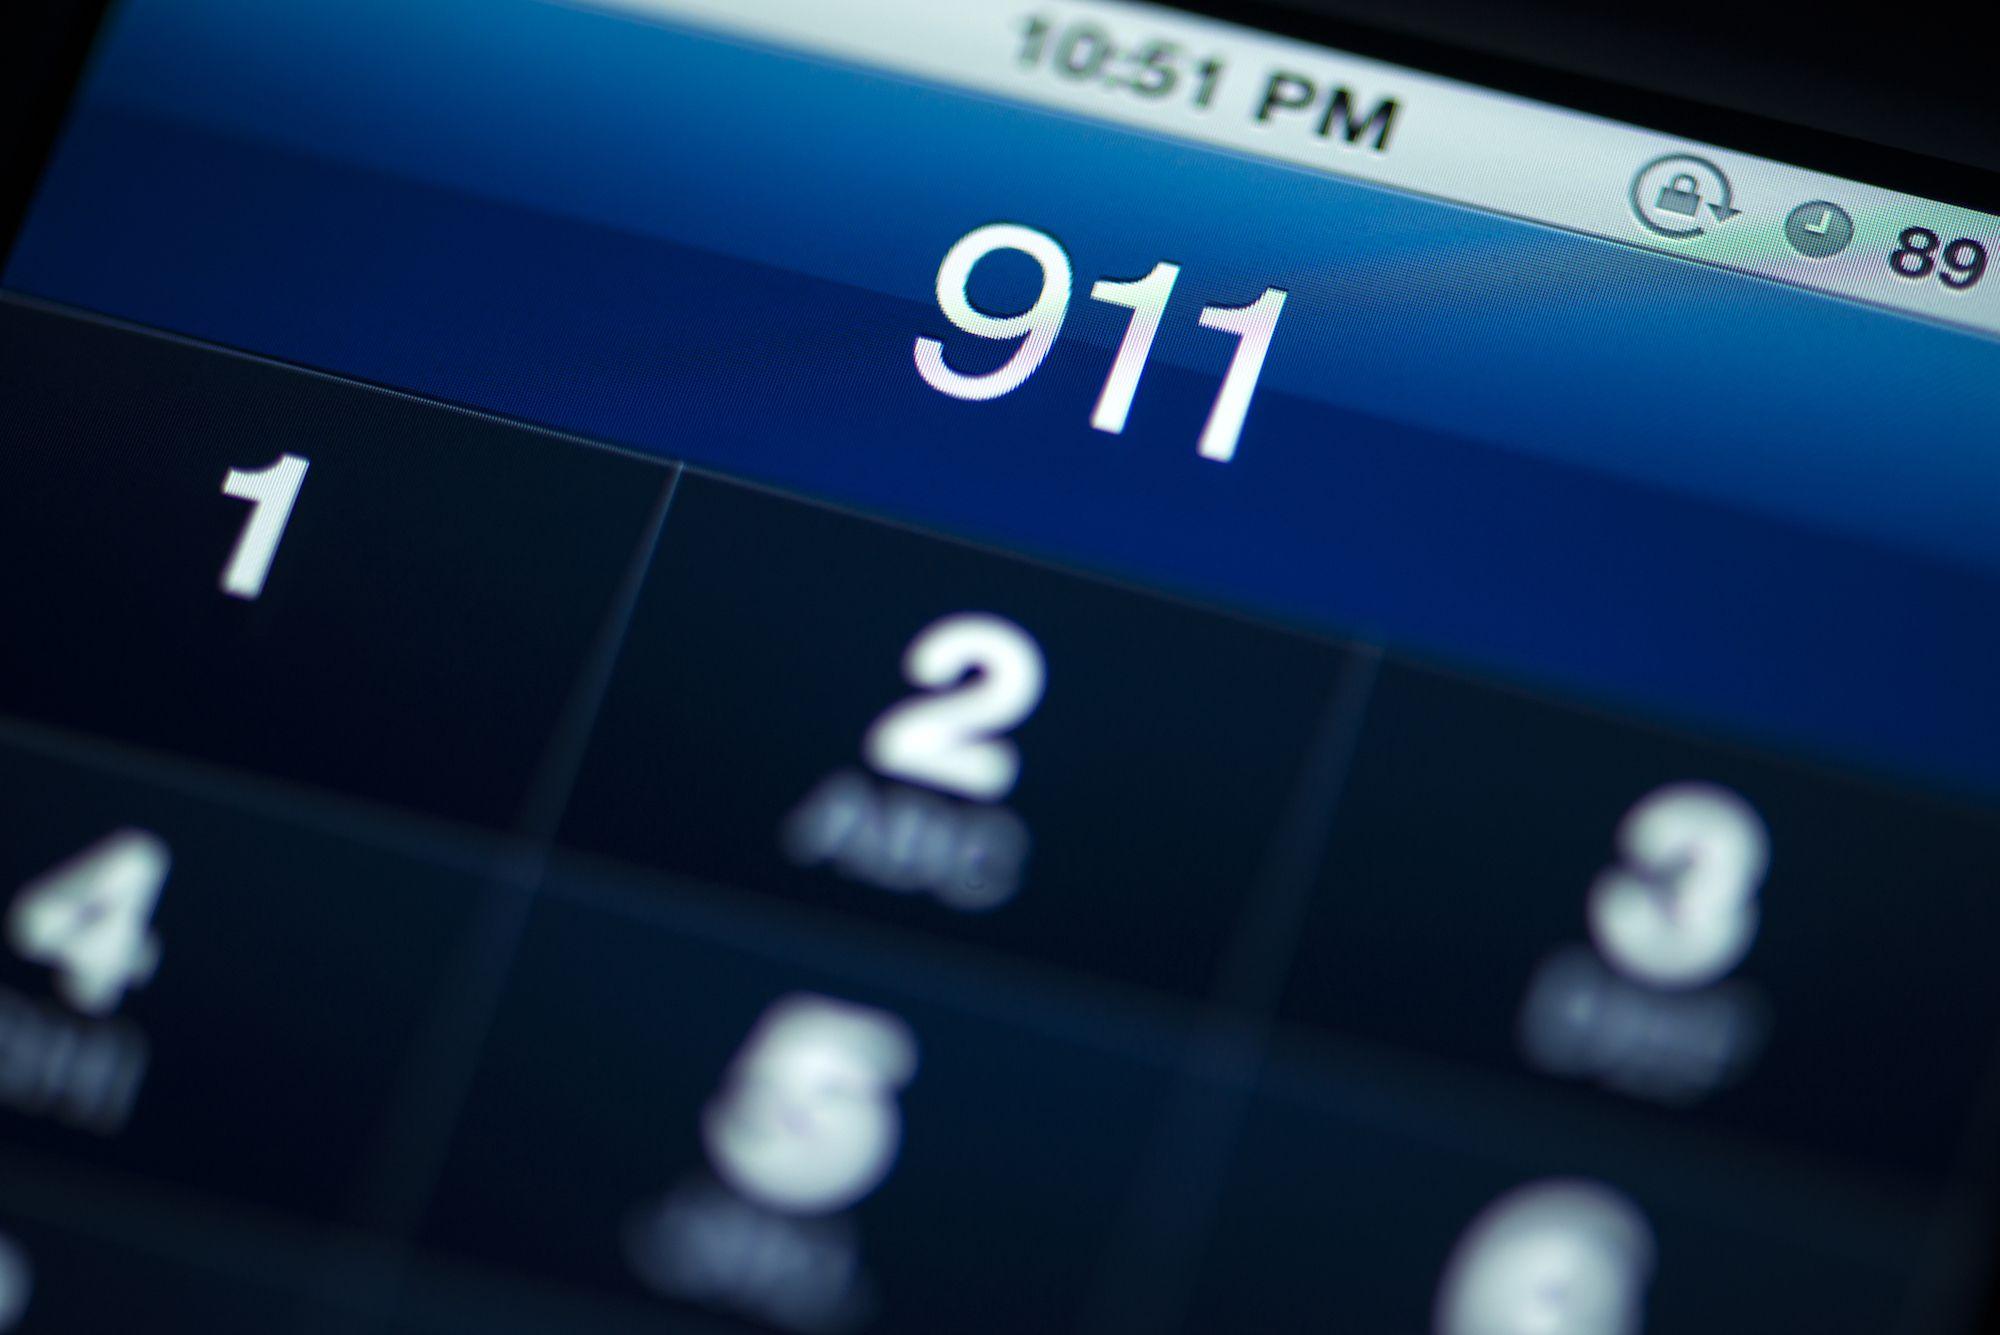 911 call on a cellphone